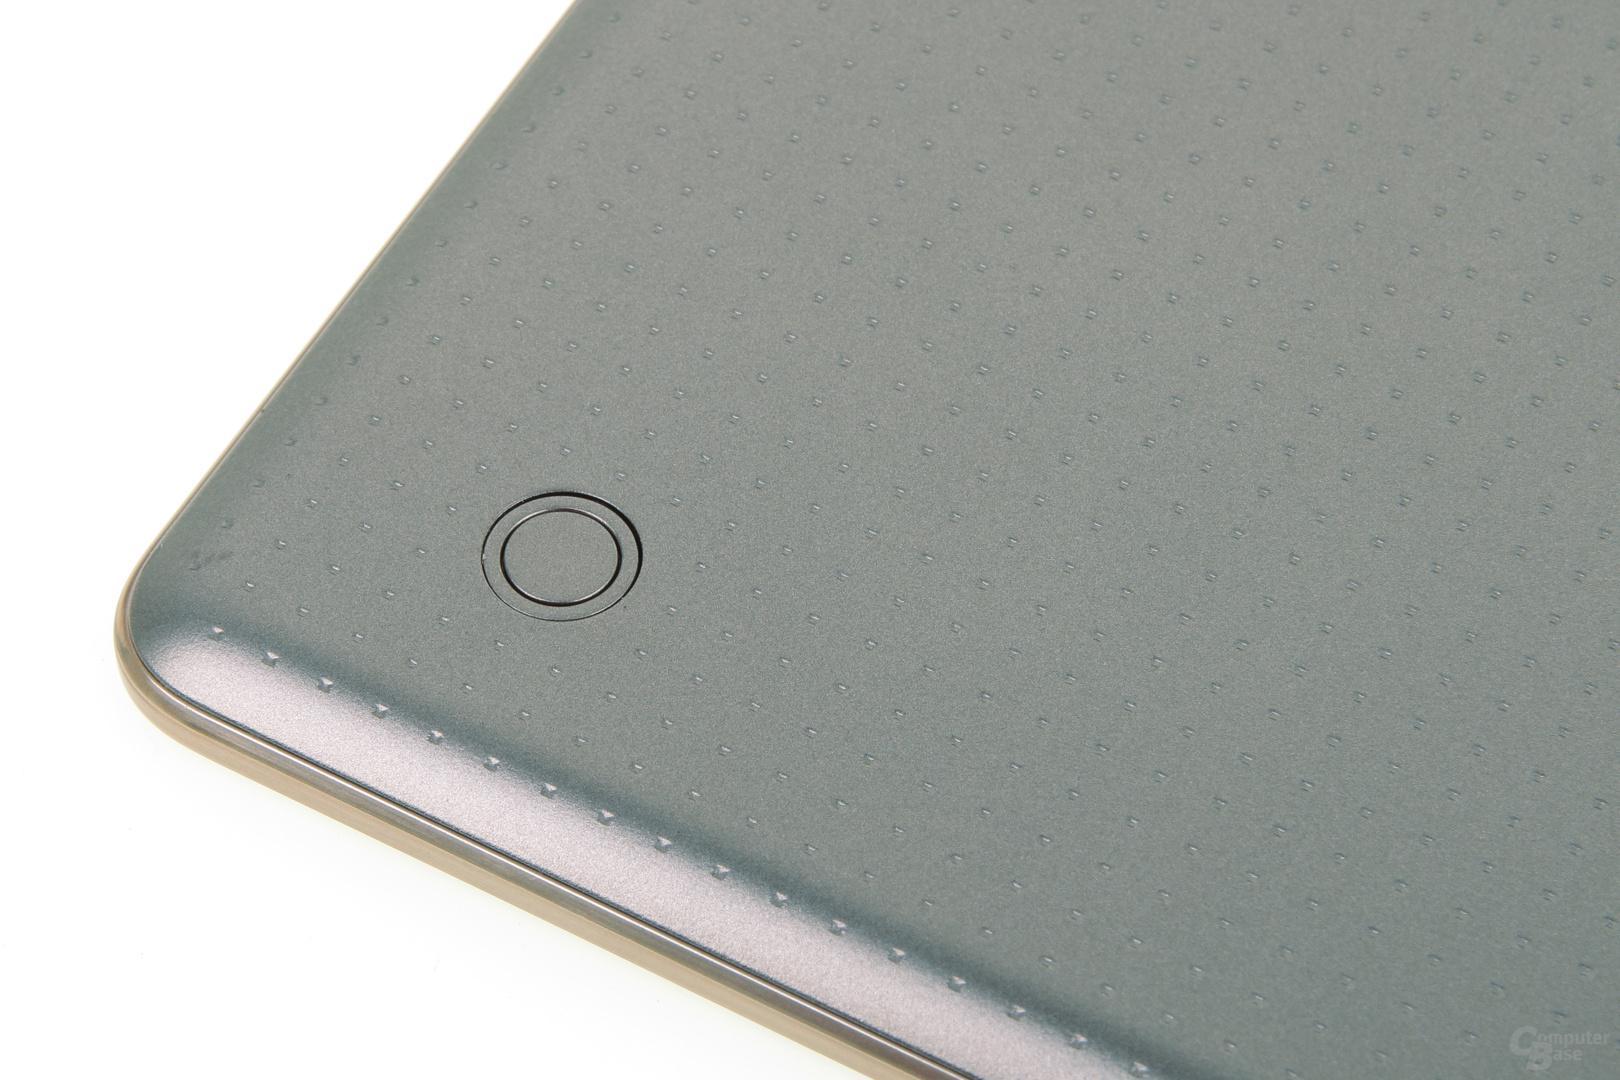 Samsung Galaxy Tab S 10.5 im Test